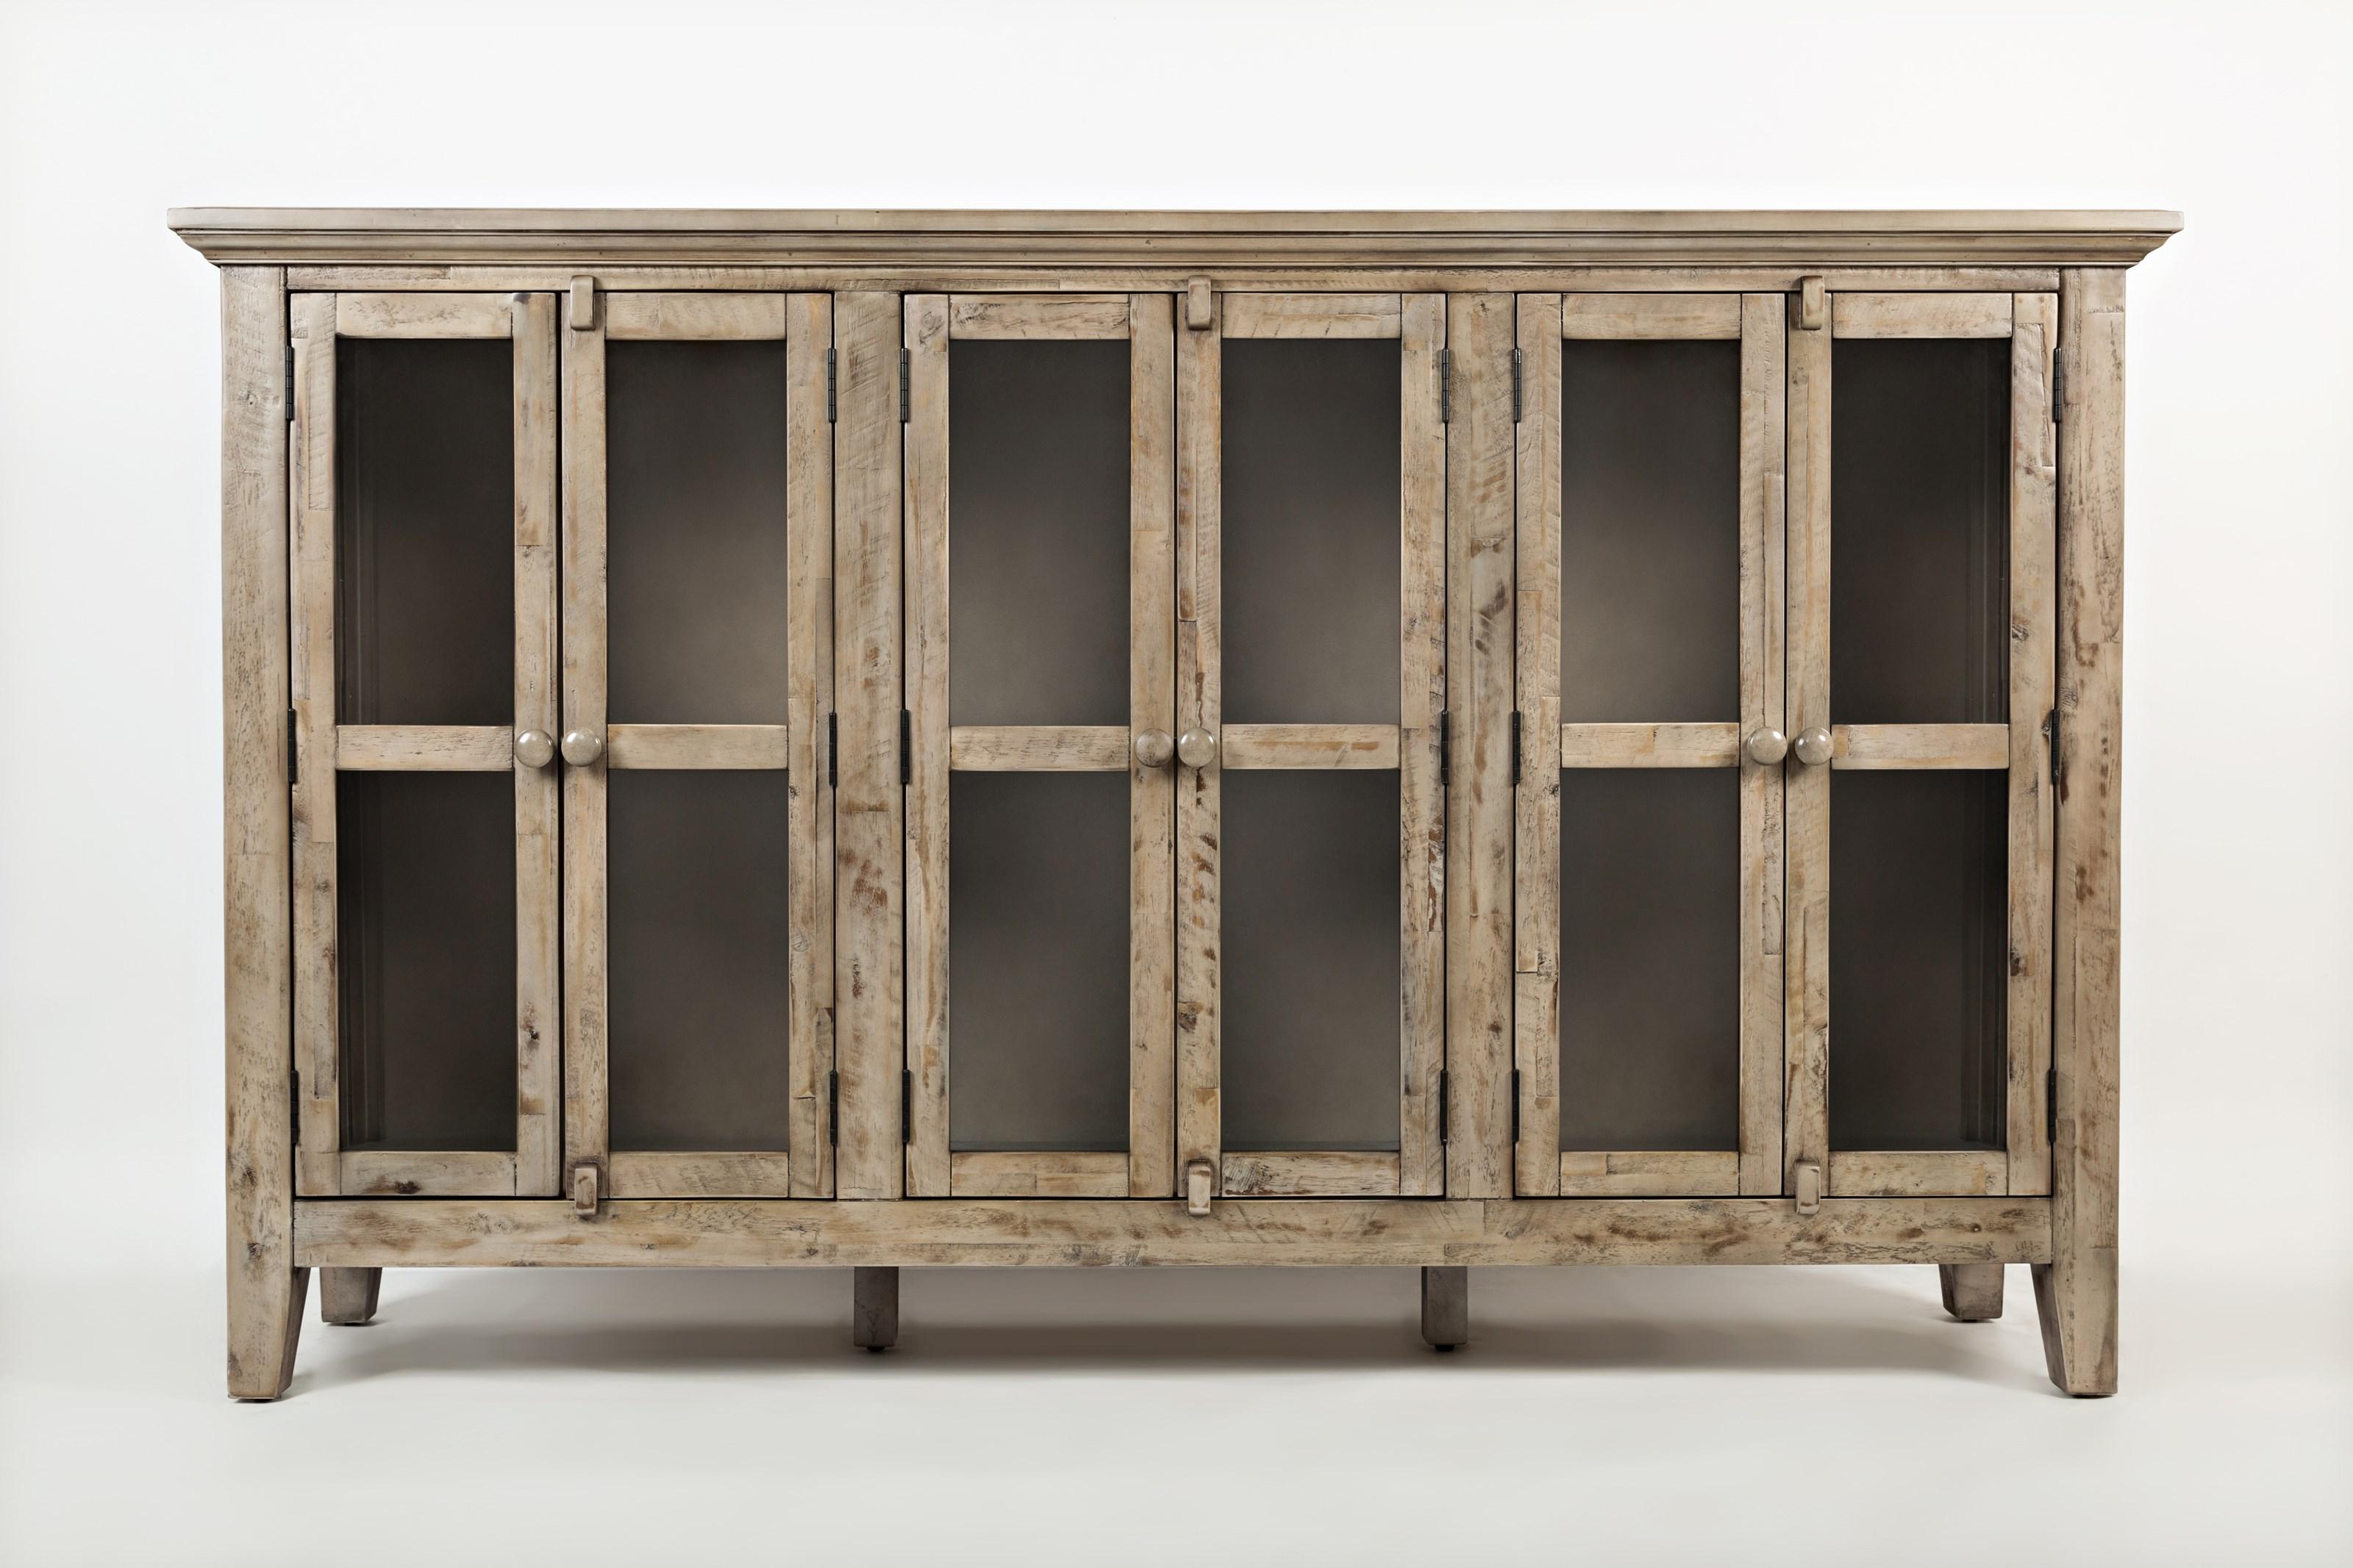 Rustic Shores 6 Door High Cabinet by Jofran at Johnny Janosik